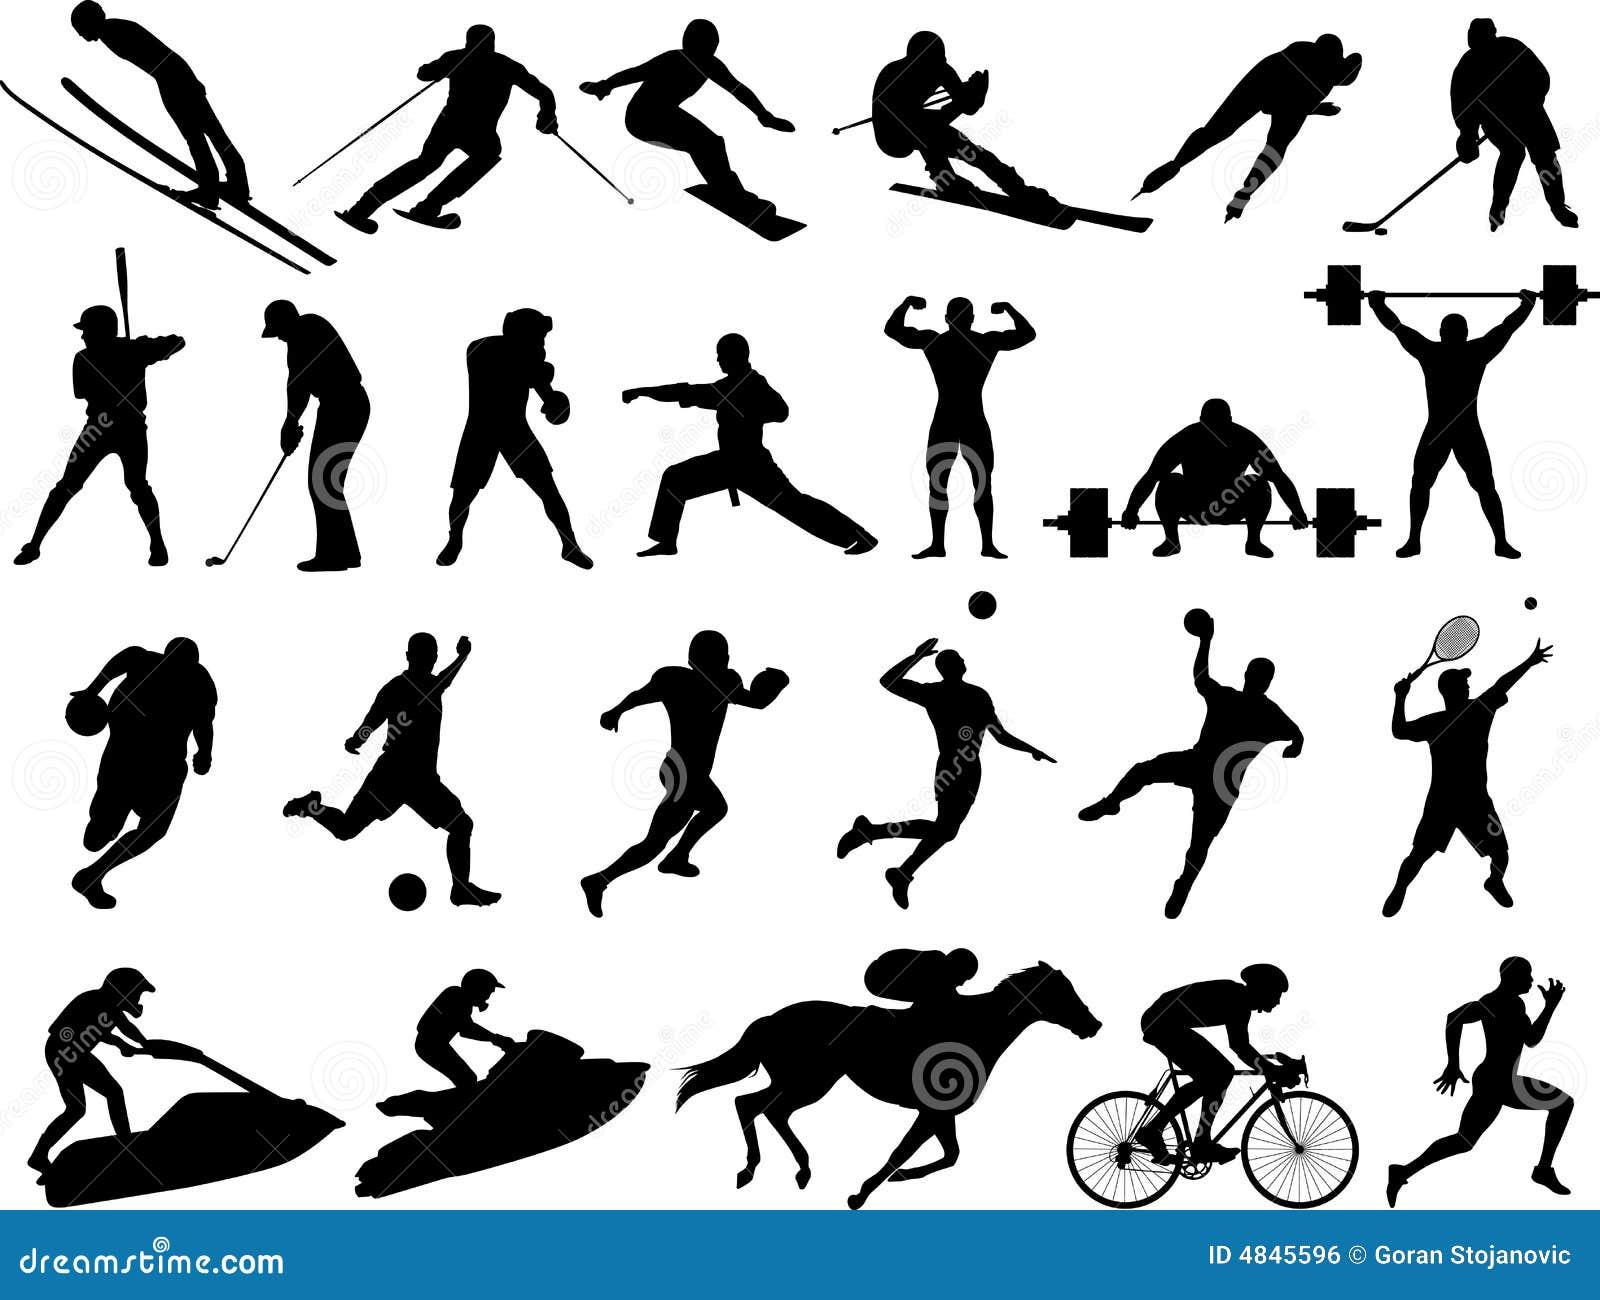 Sports icons free vector in adobe illustrator ai (. Ai.